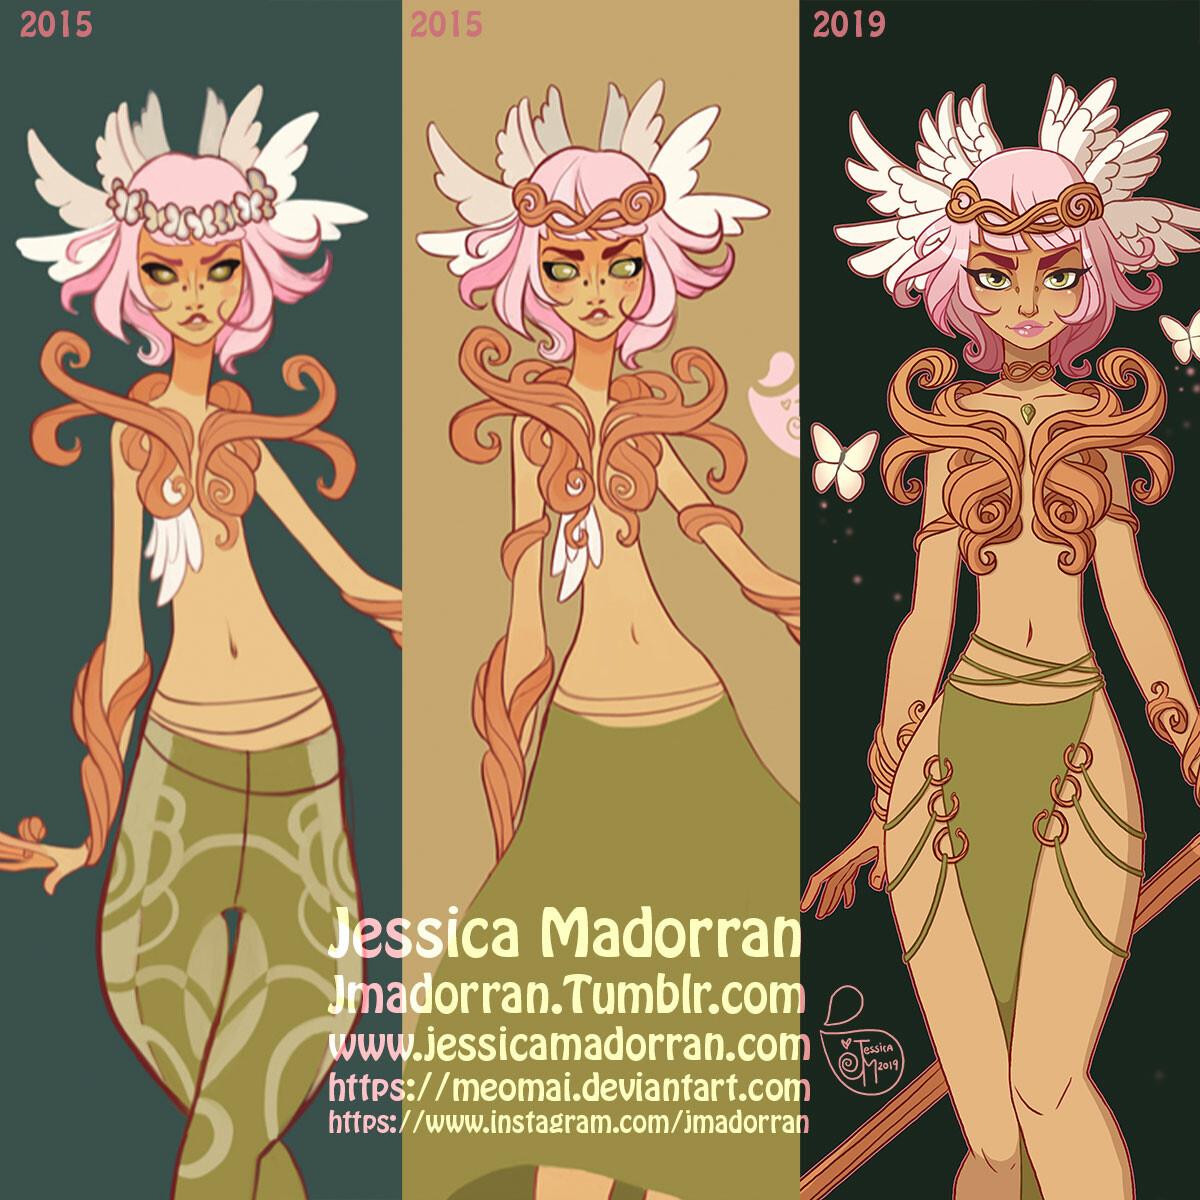 Jessica madorran character design redesign wood queen 2019 square comaparison version artstation